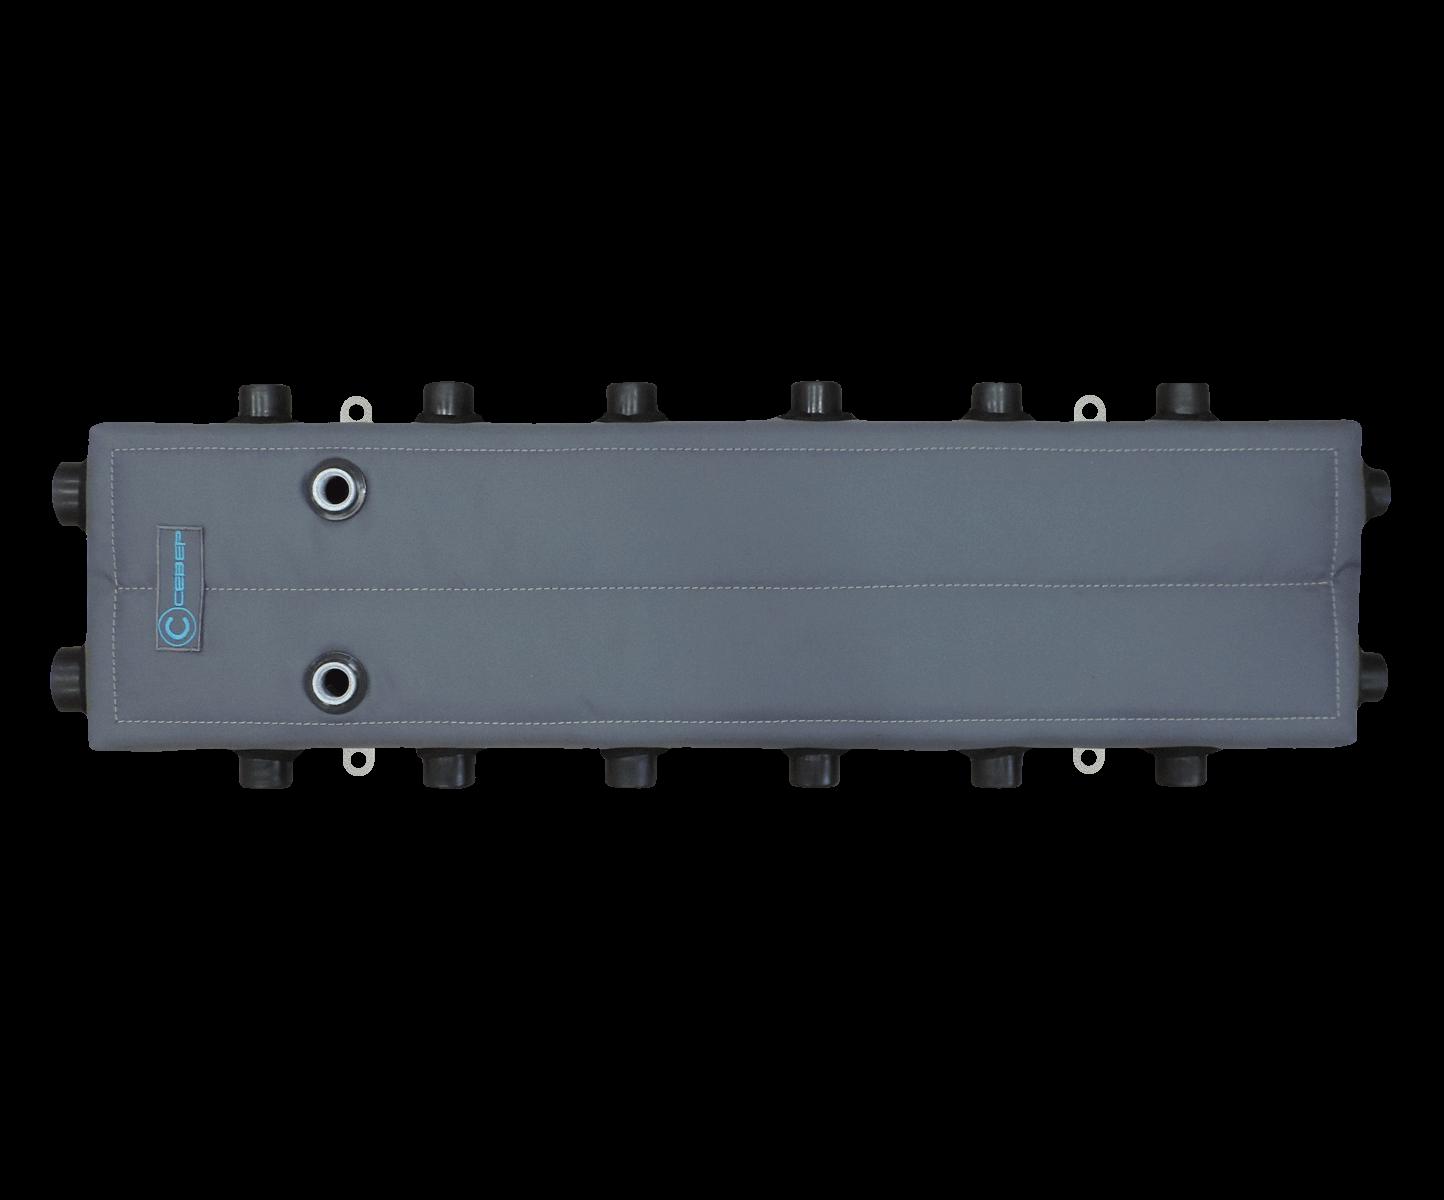 Теплоизоляция, теплоизоляционный чехол для гидрообвязки Север КМ7